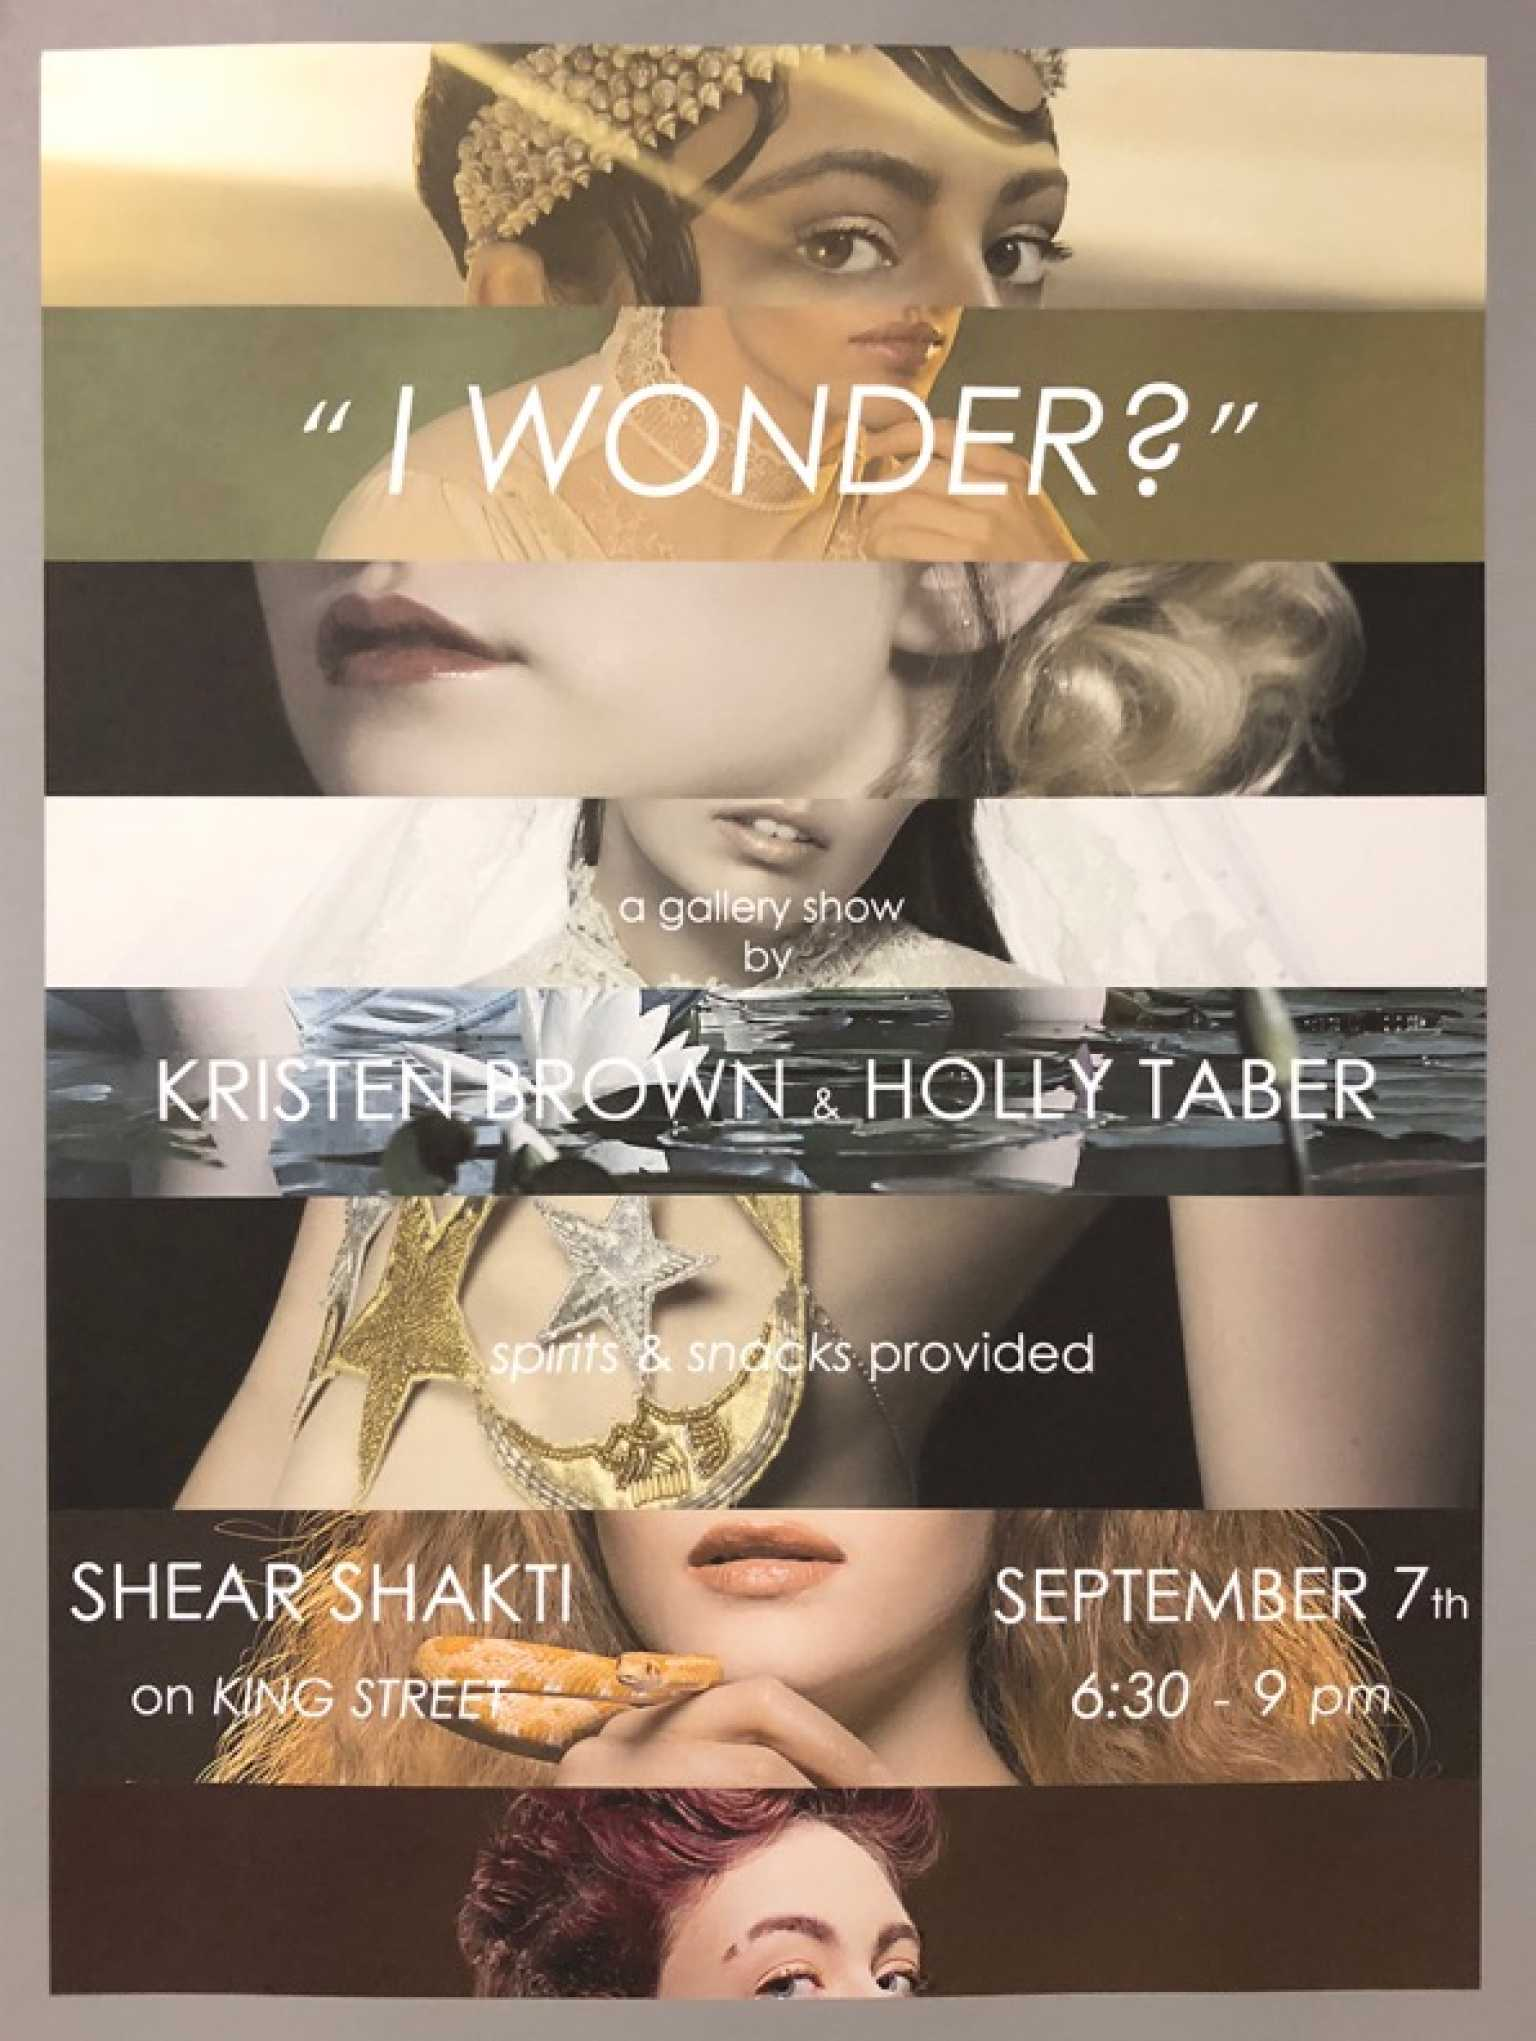 I wonder? poster